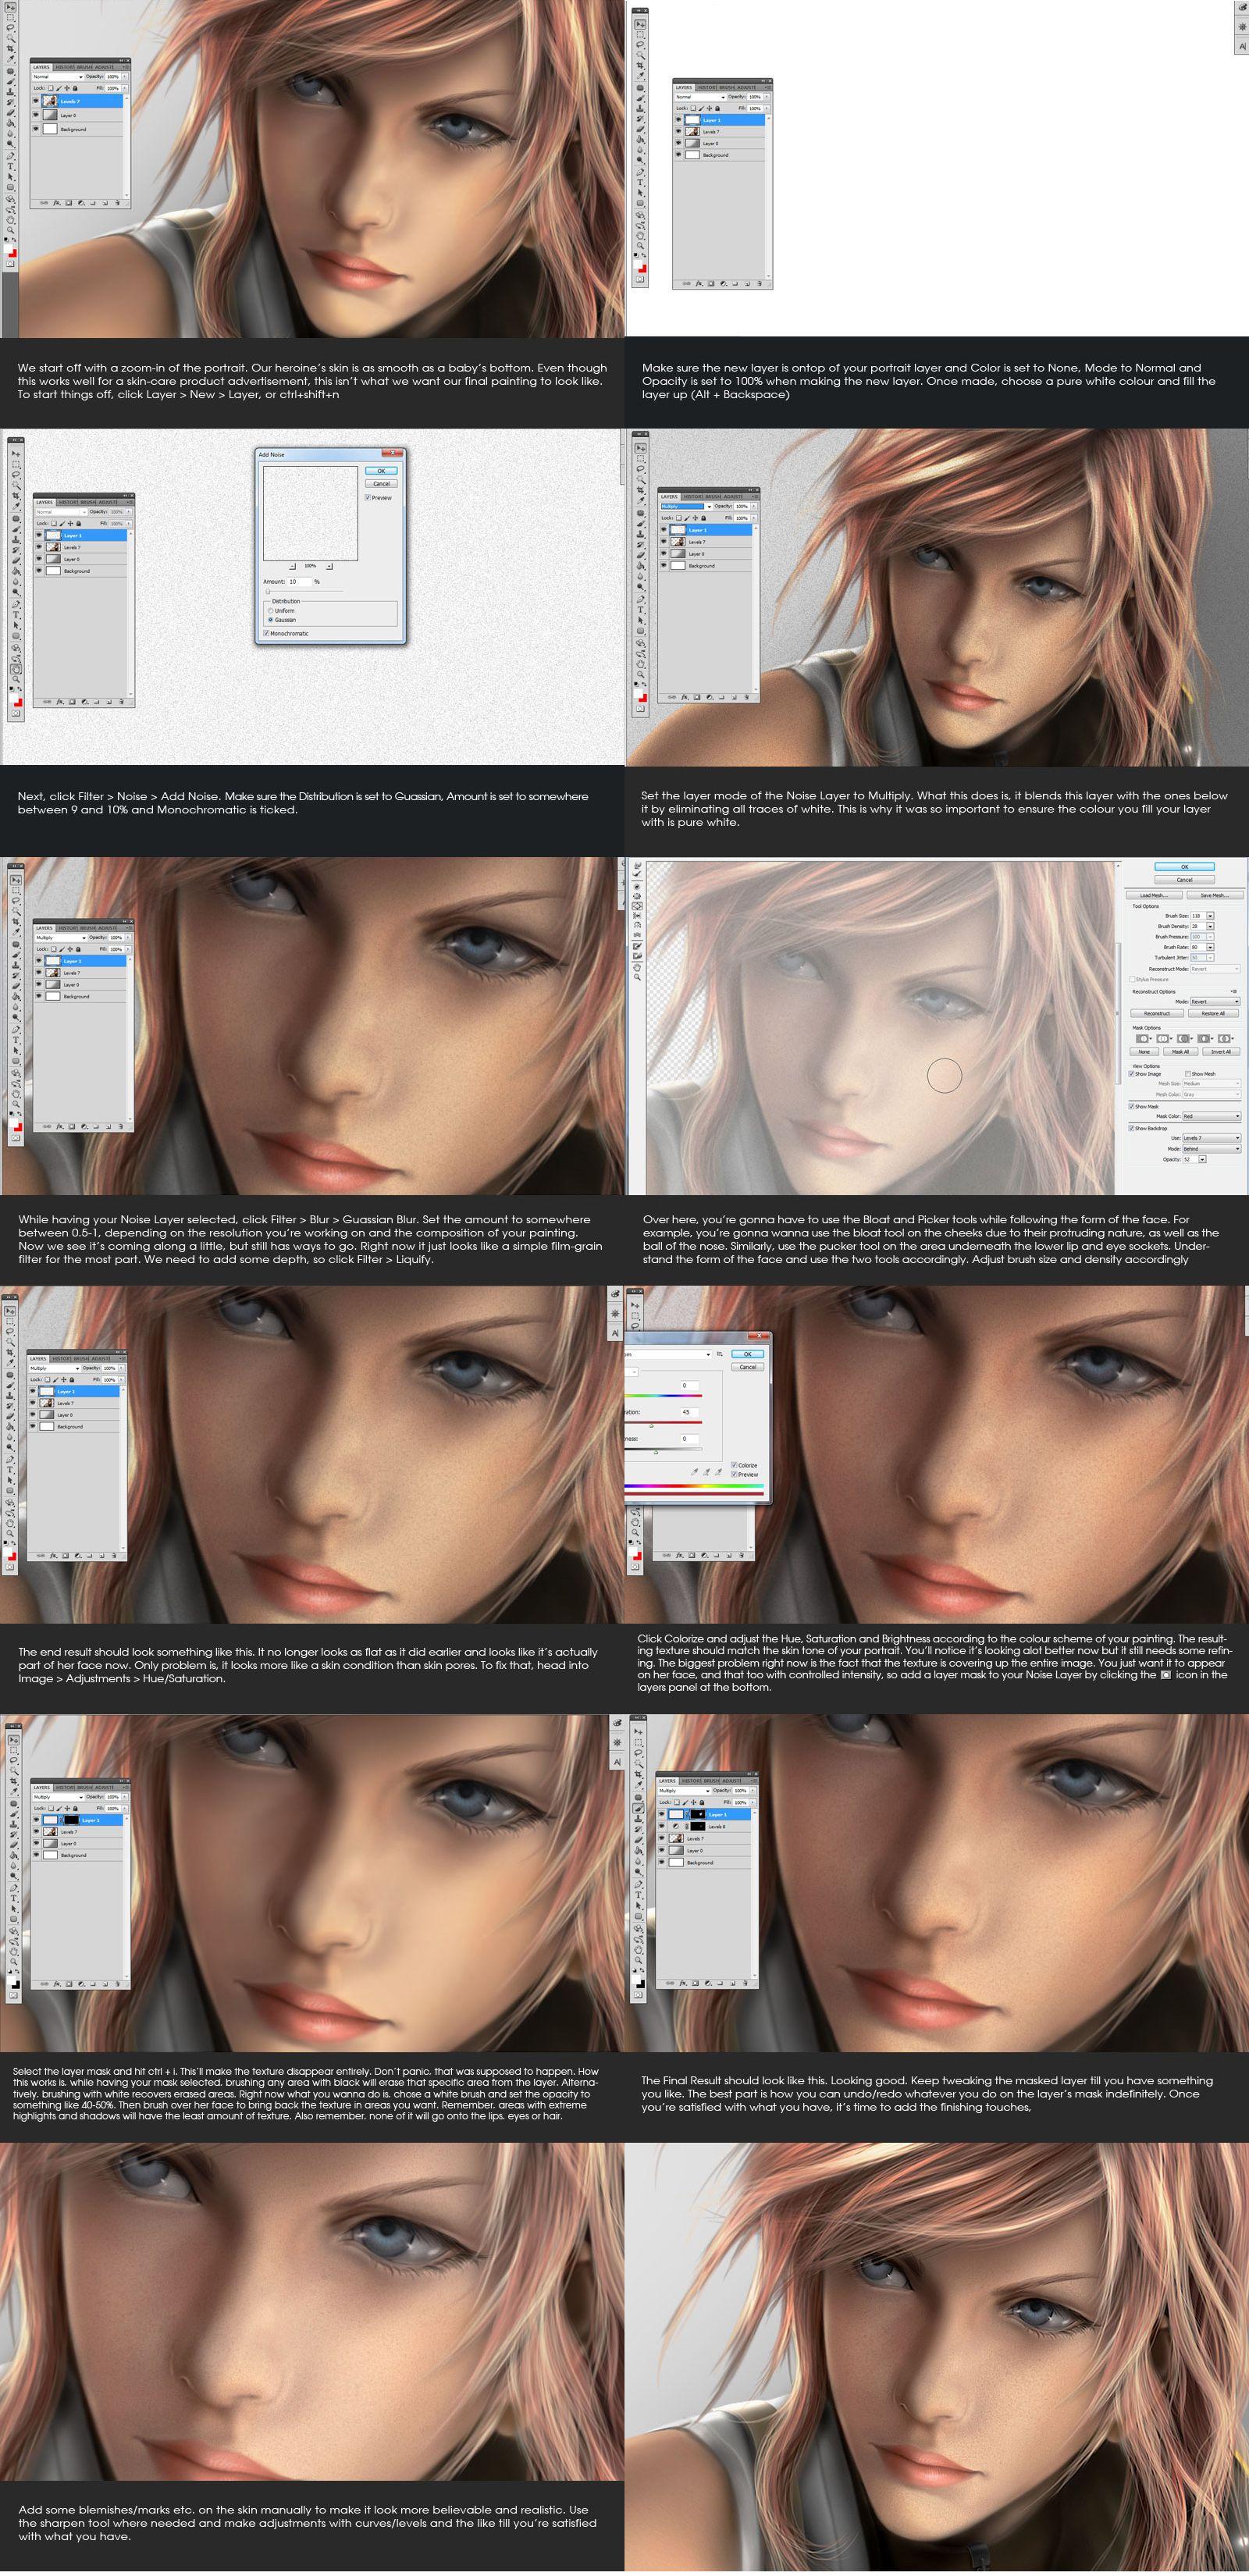 Skin Texture Tutorial by Aameeyurdeviantartcom on deviantART